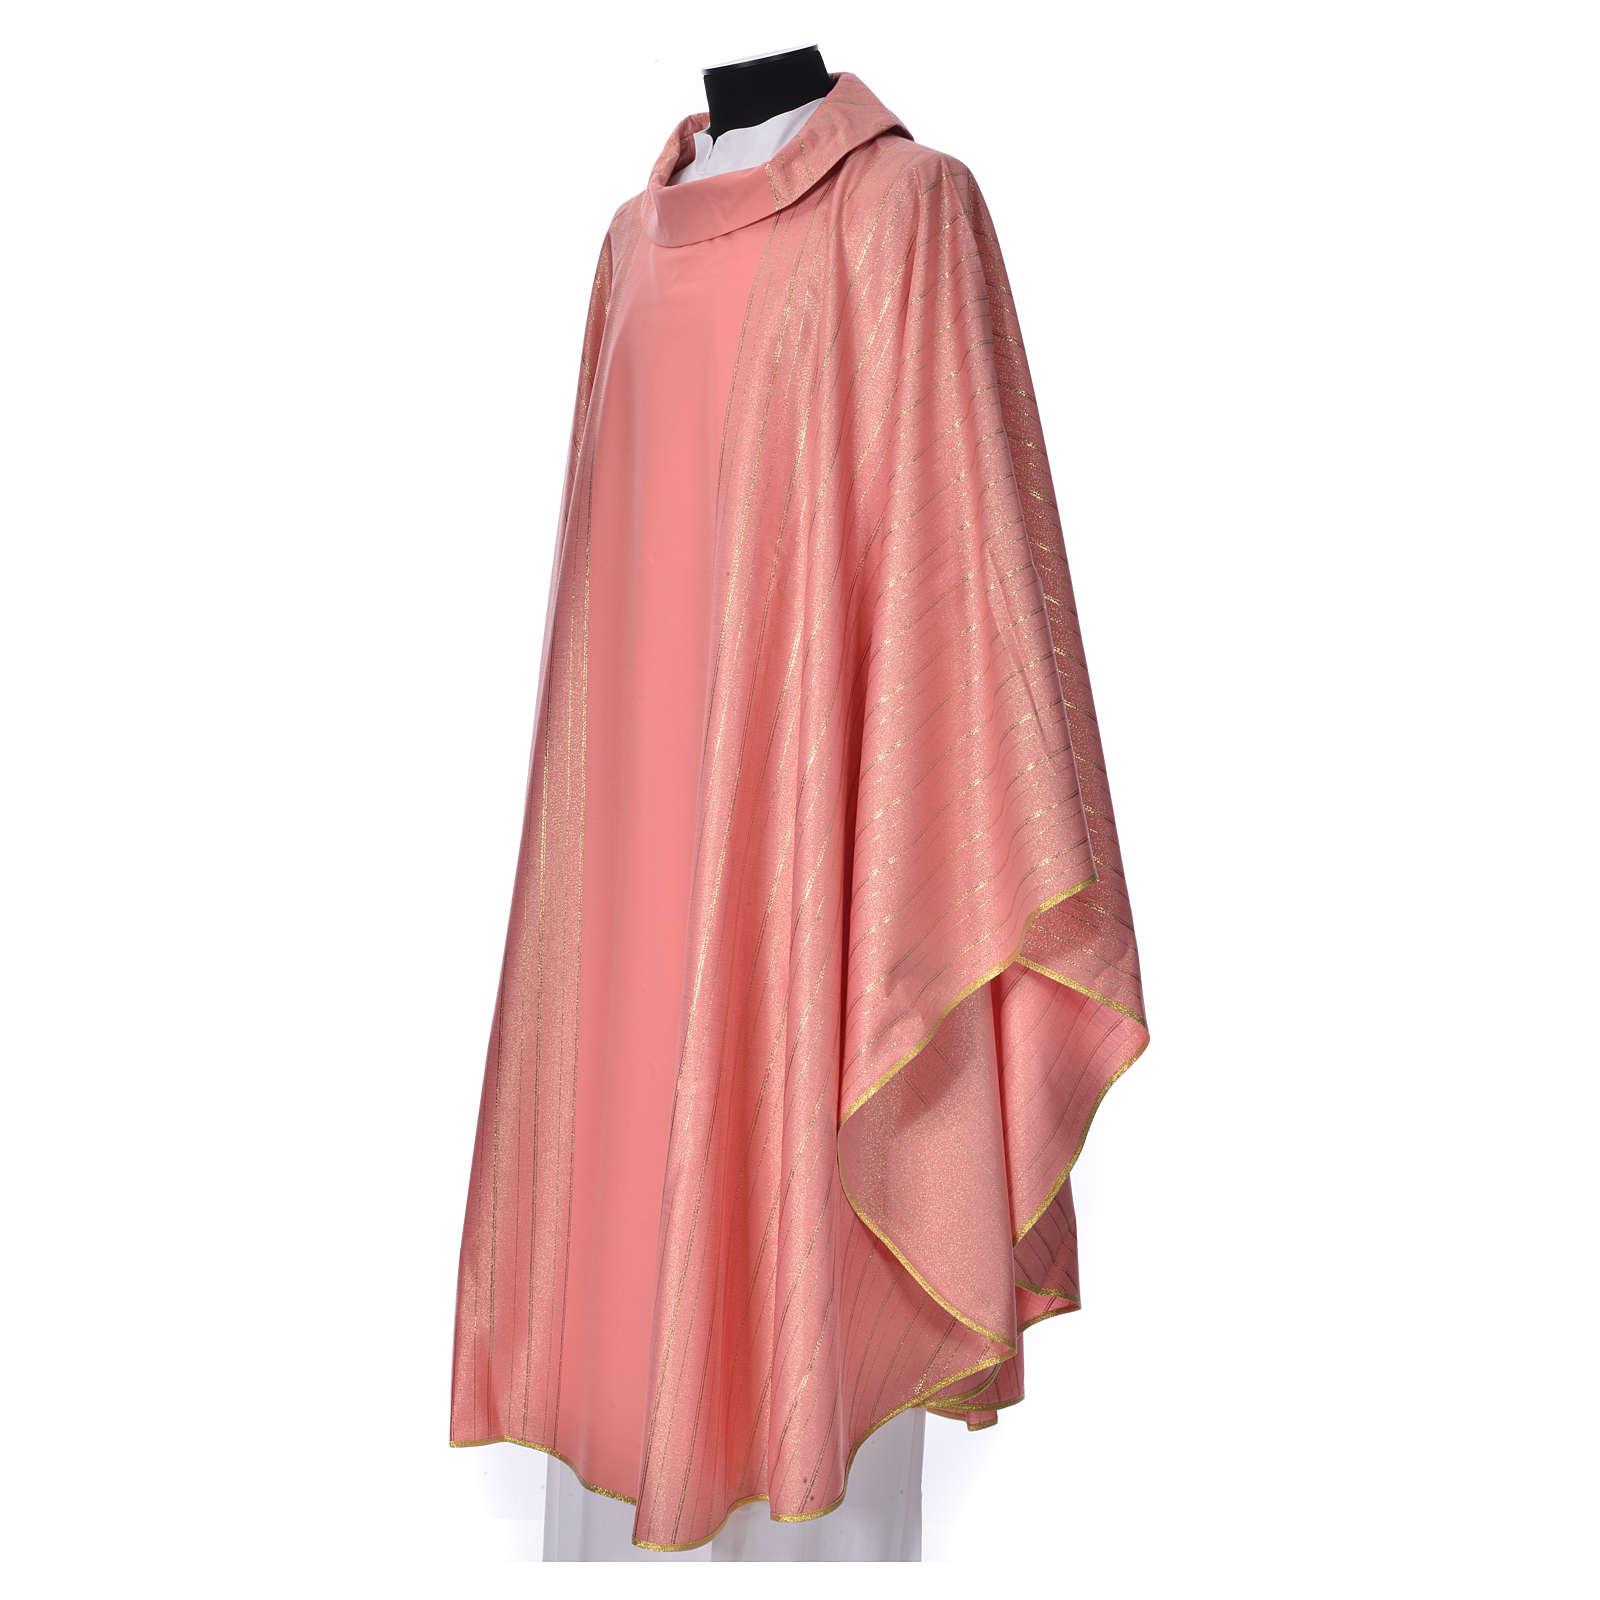 Casula rosa pura lana vergine doppio ritorto Tasmania 4